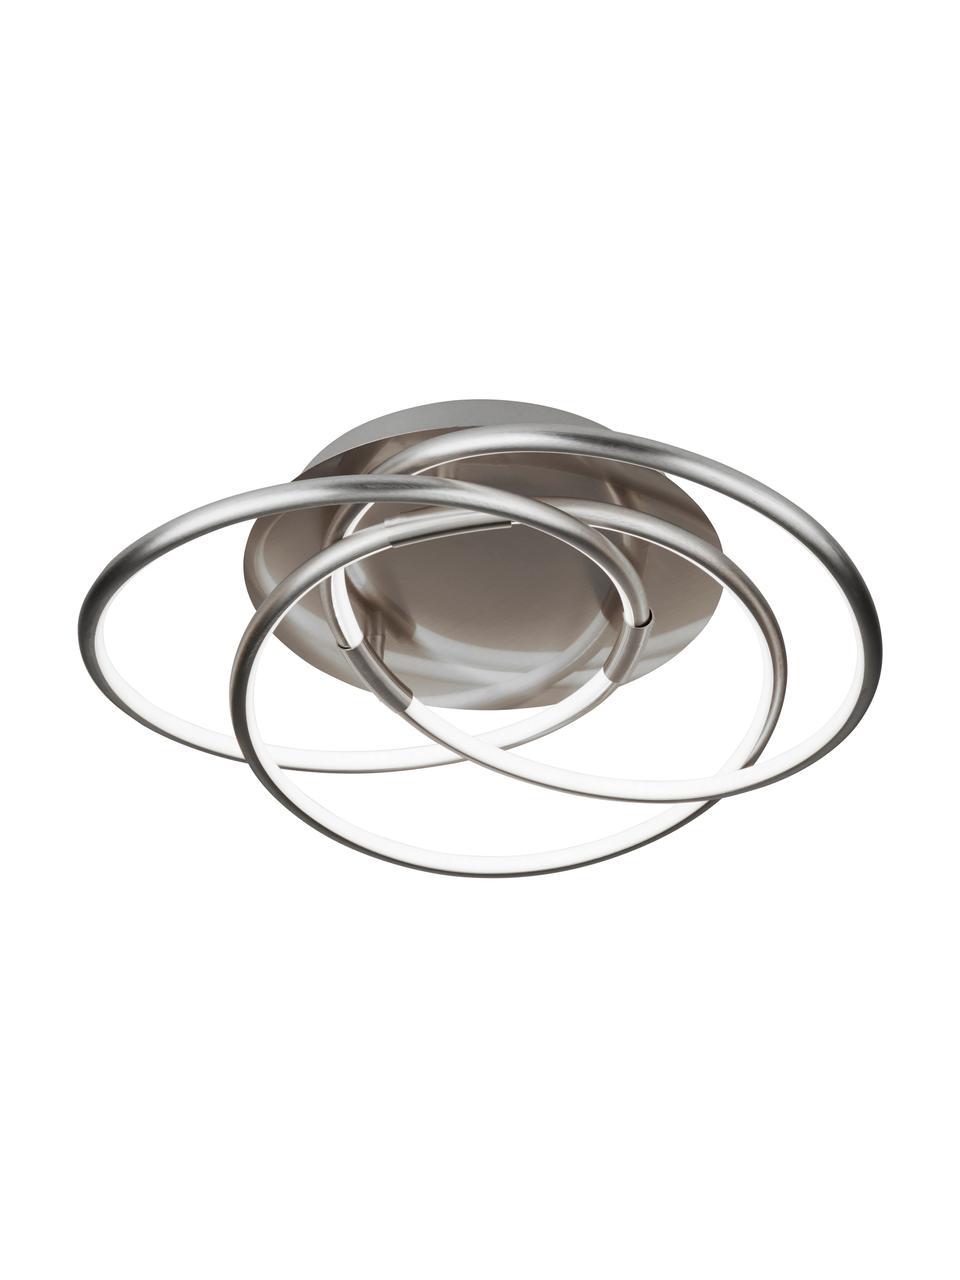 Design LED-plafondlamp Magic, Geborsteld aluminium, Aluminium, Ø 48 x H 22 cm